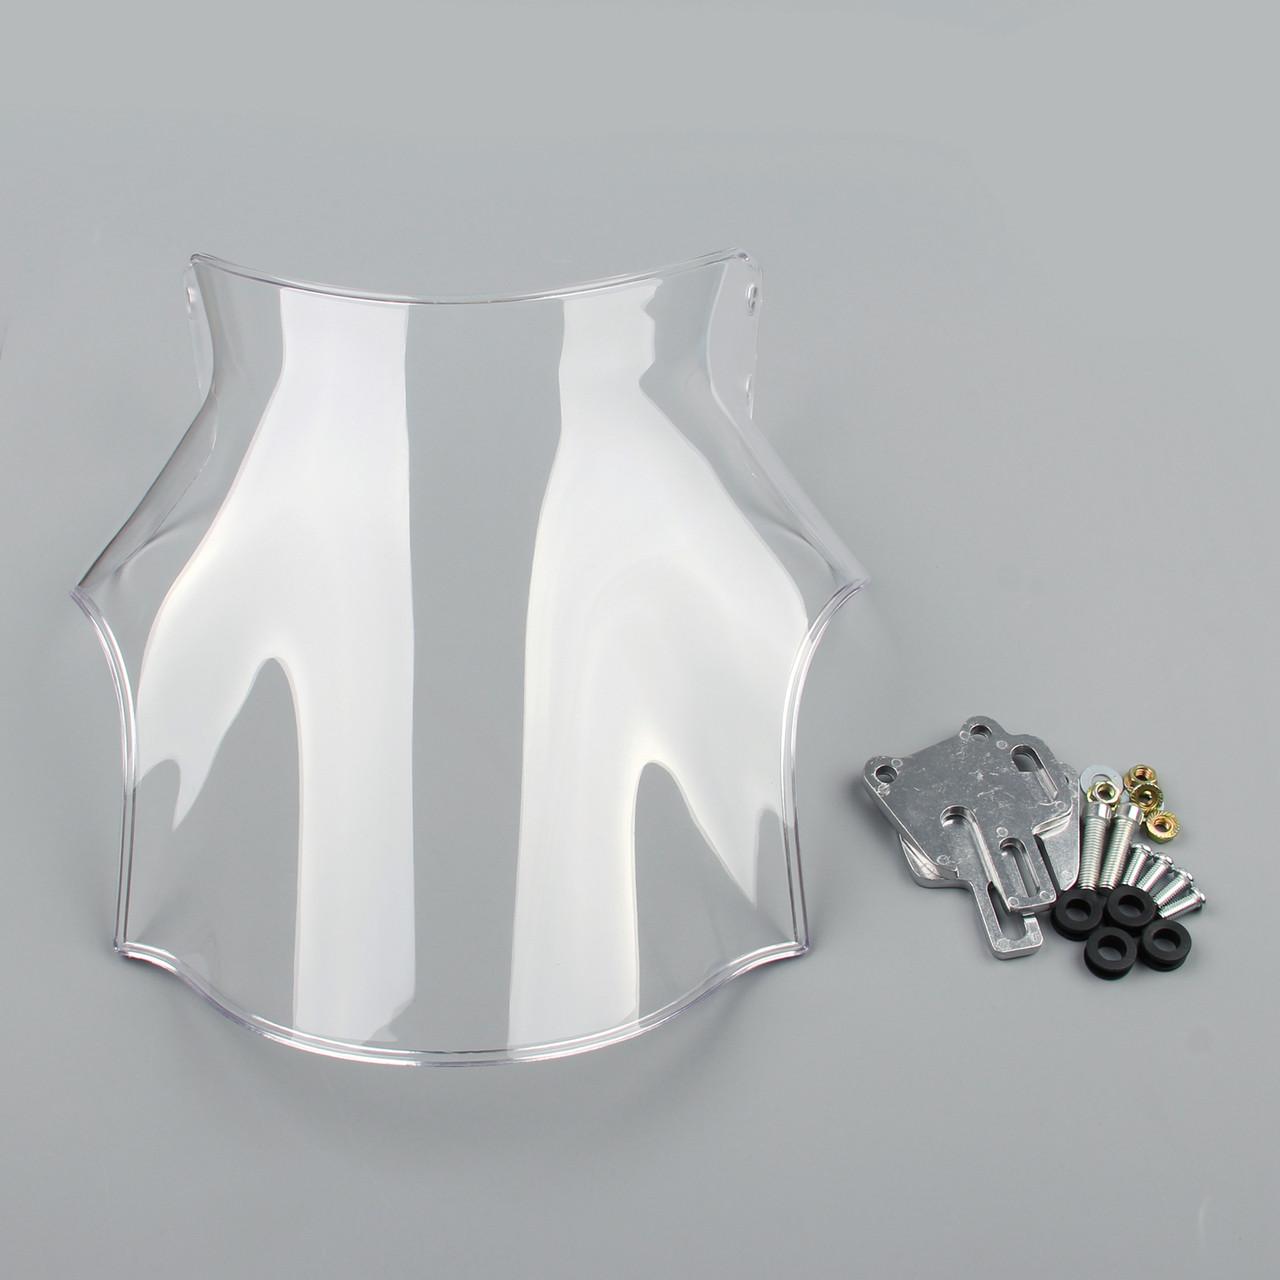 Windscreen Windshield Honda CB 250 400 600 750 900 919 1000 1100SF 1300 Clear